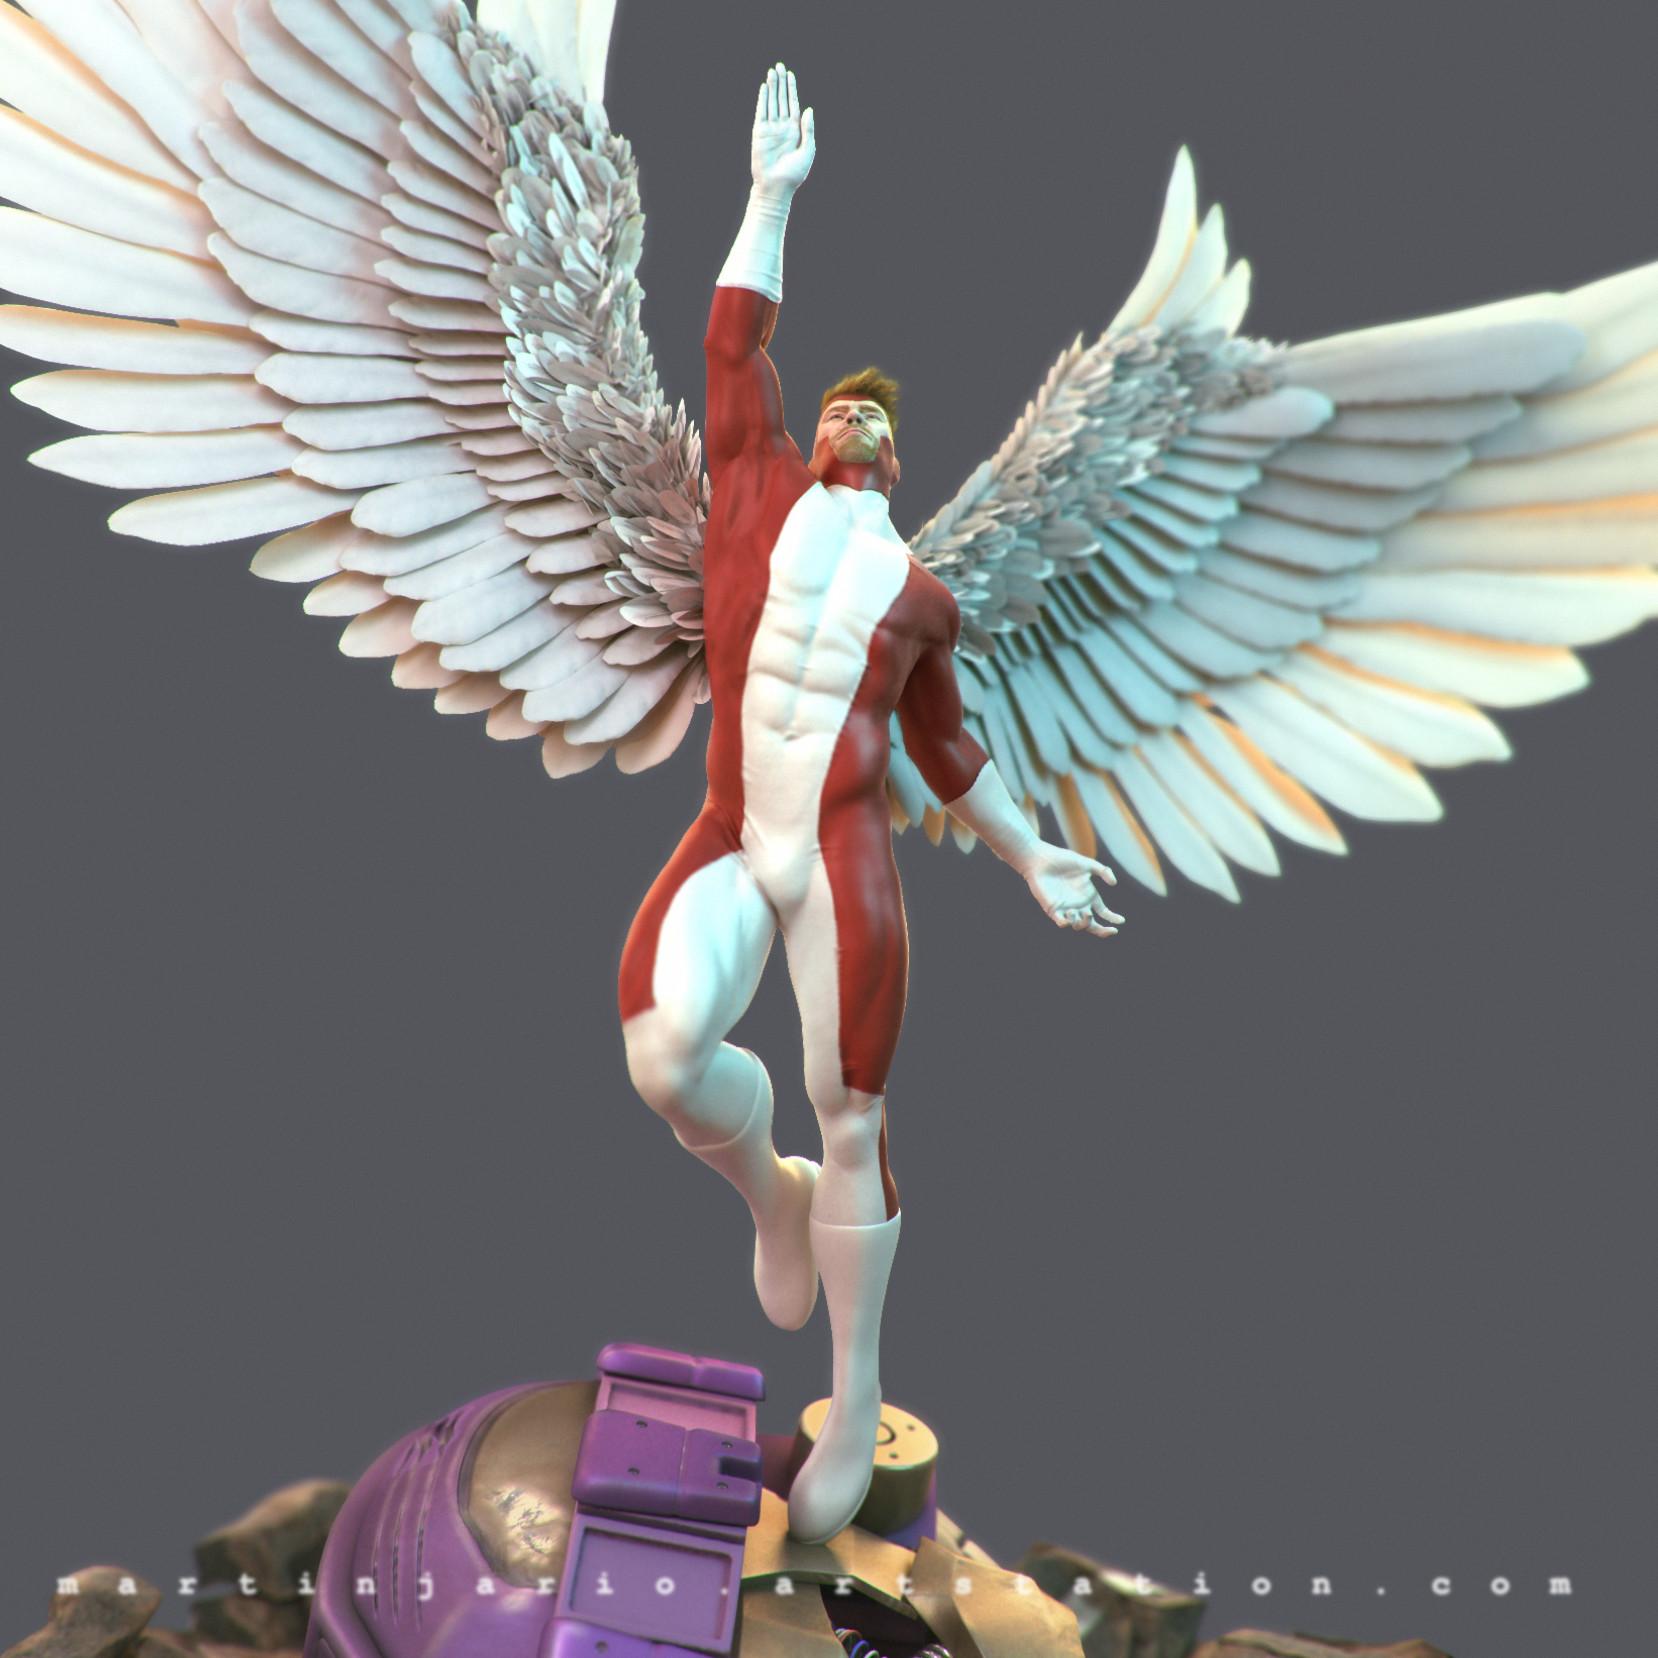 Martin jario martinjario angel xmen zbrush detail 07